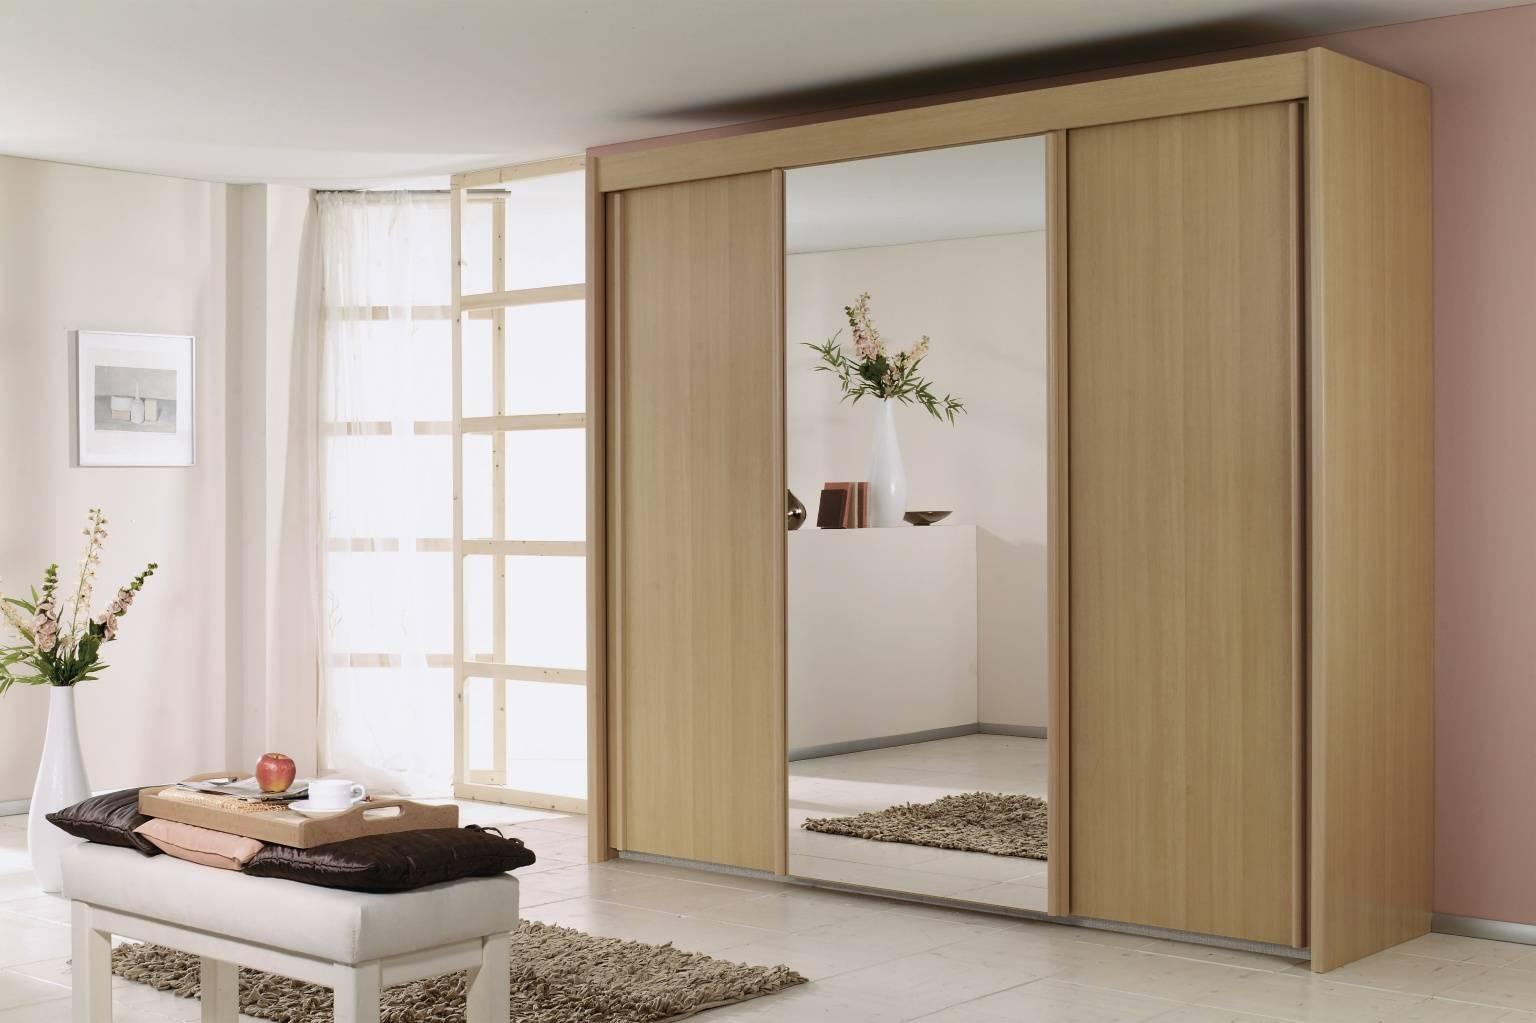 Rauch Imperial Sliding Wardrobe – Furniture Brothers intended for Rauch Imperial Wardrobes (Image 9 of 15)